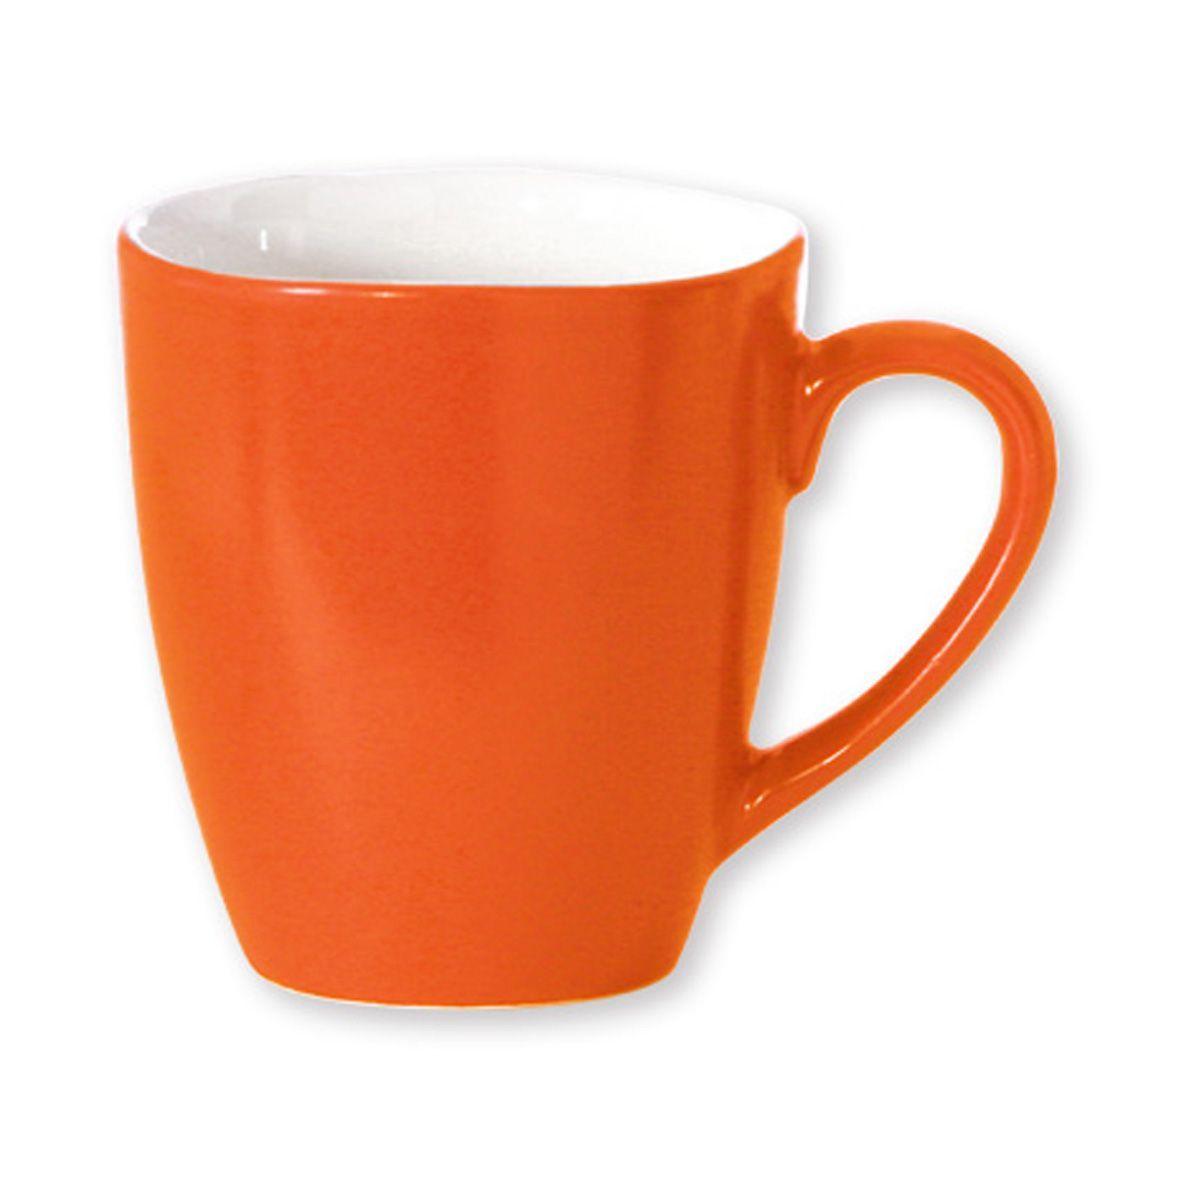 Mug terana orange ext rieur bruno evrard cr ation for Table exterieur orange